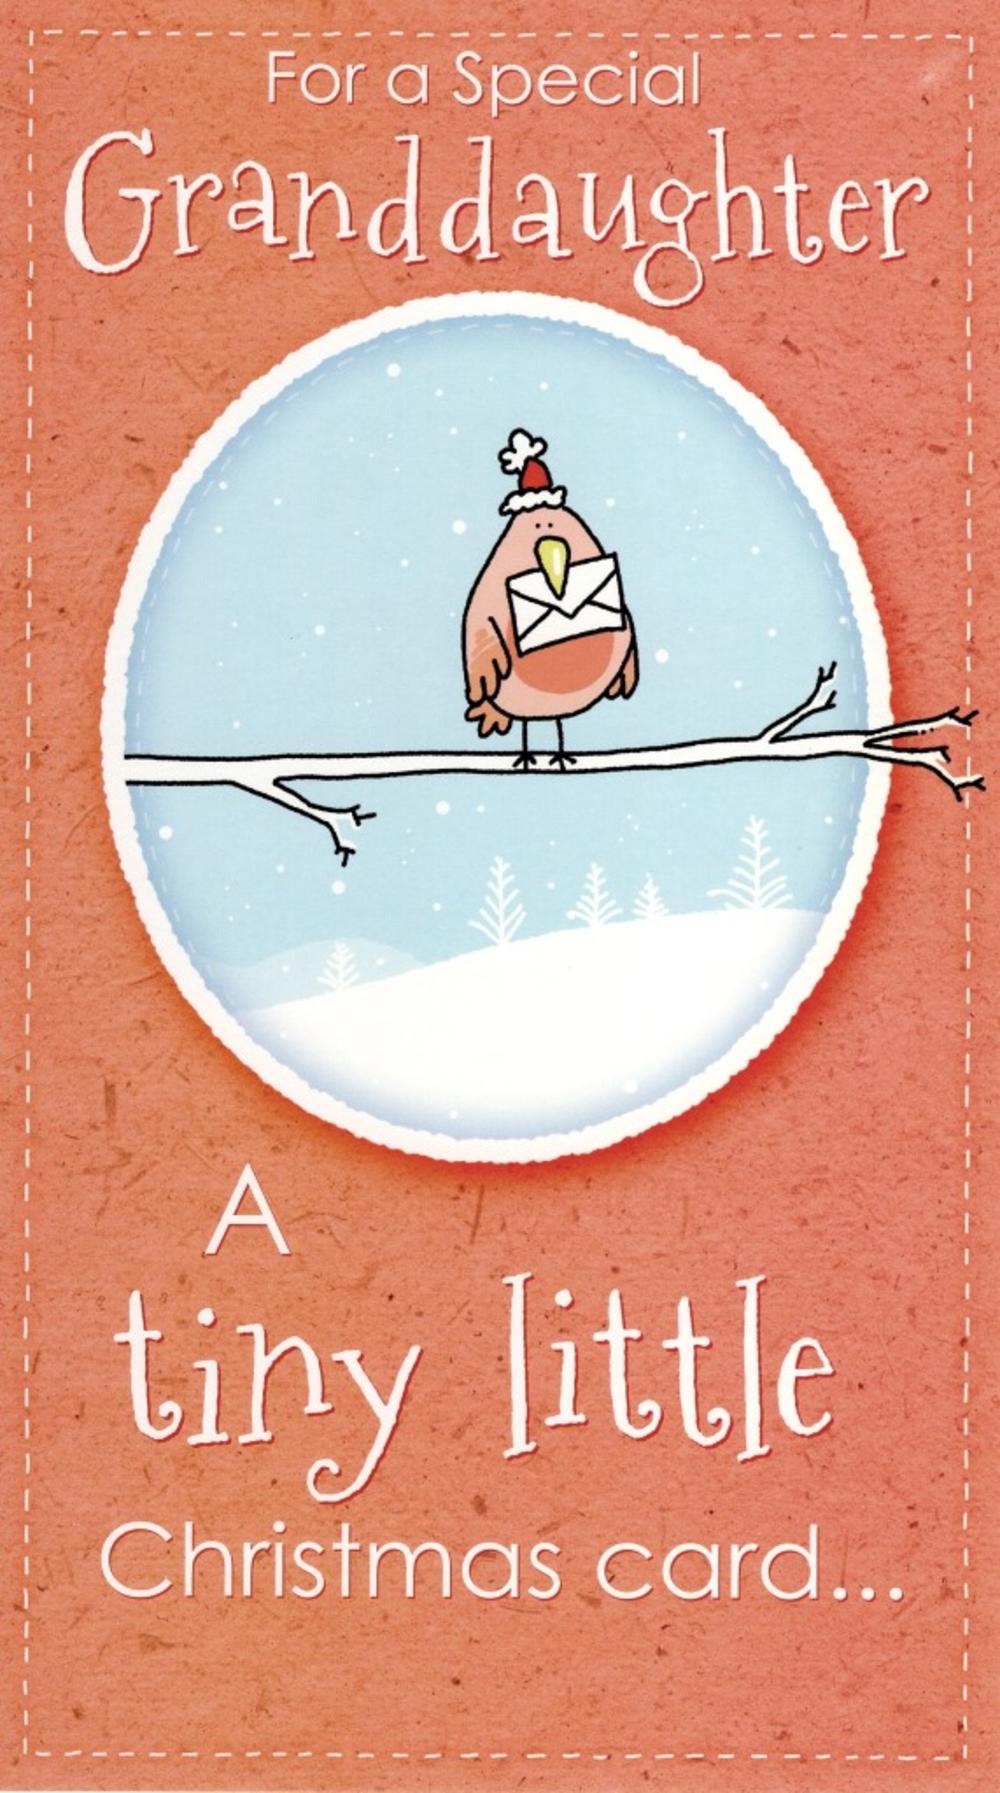 Special Granddaughter Big Hug Christmas Card | Cards